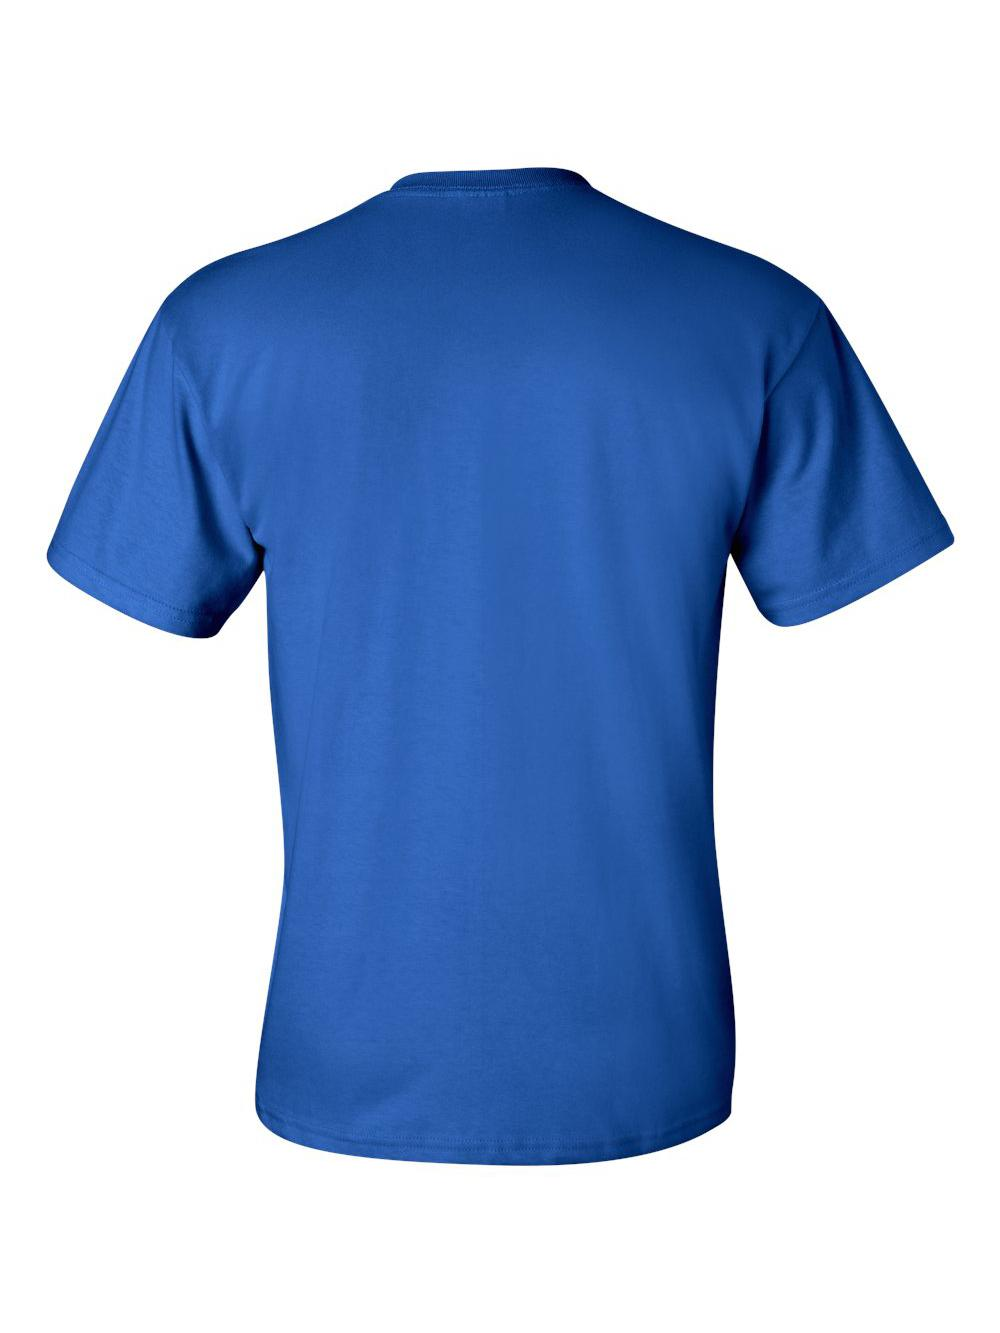 Gildan-Ultra-Cotton-T-Shirt-with-a-Pocket-2300 thumbnail 31